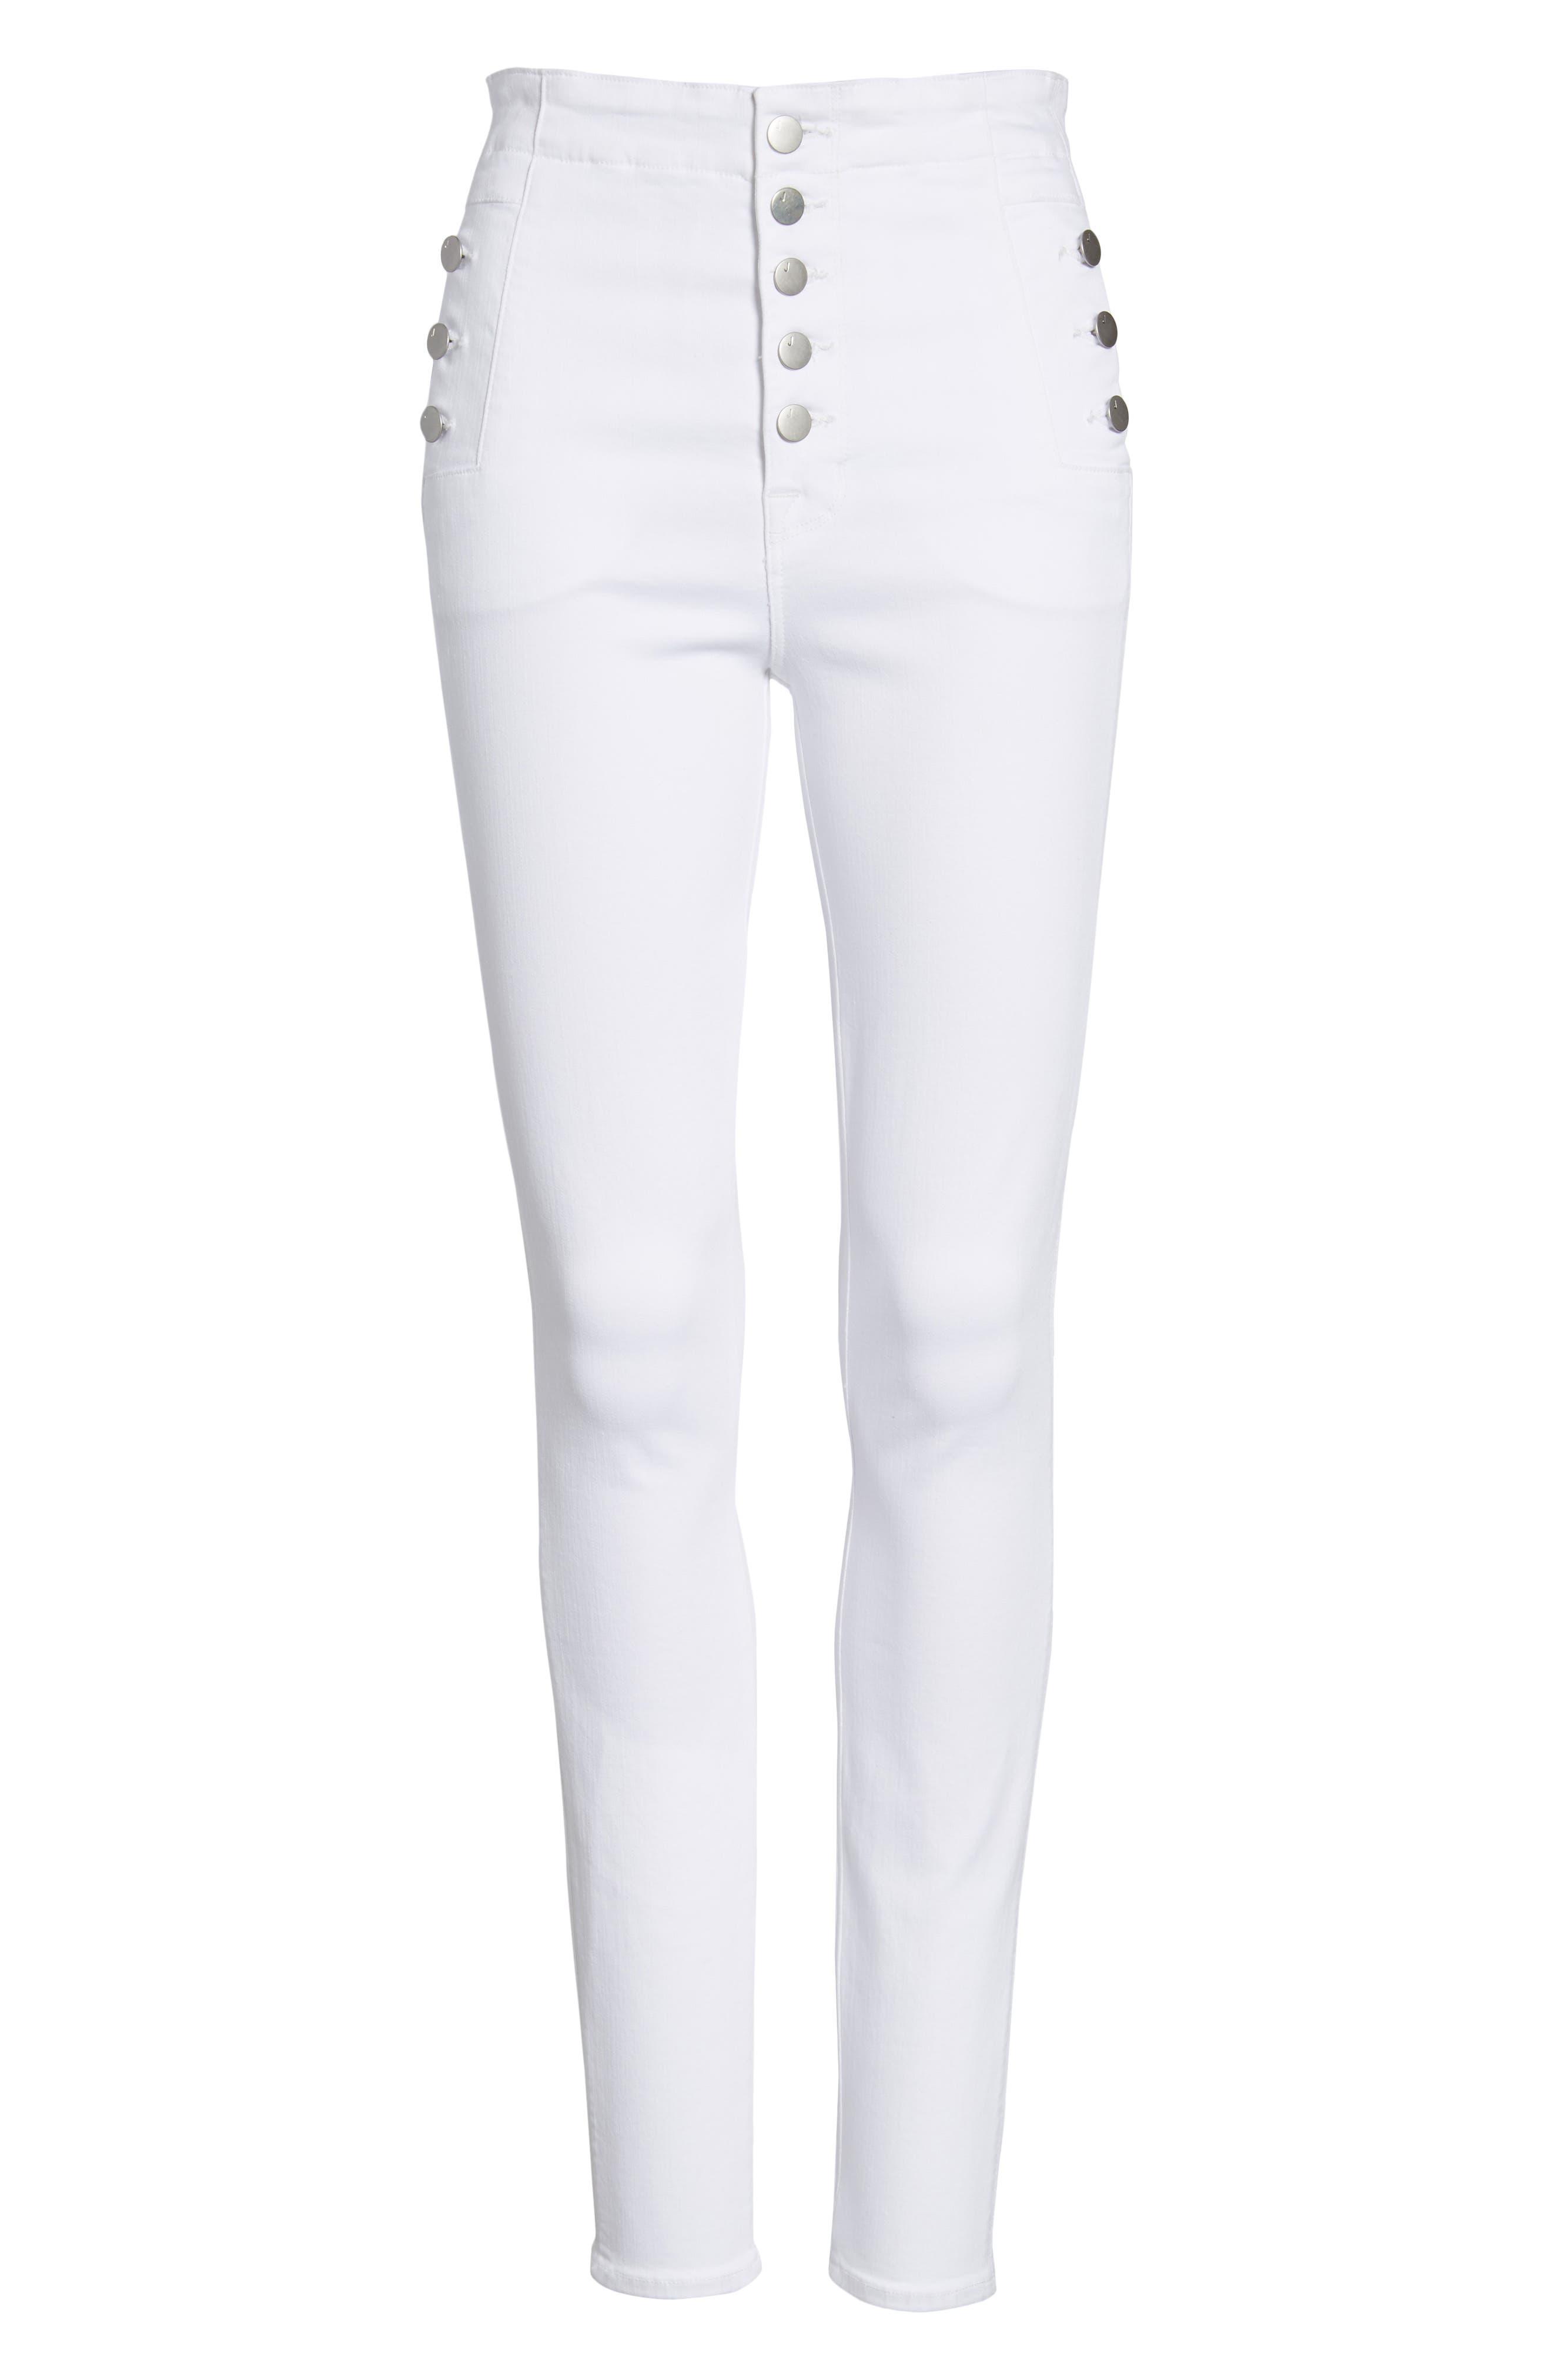 Natasha Sky High Super Skinny Jeans,                             Alternate thumbnail 7, color,                             WHITE